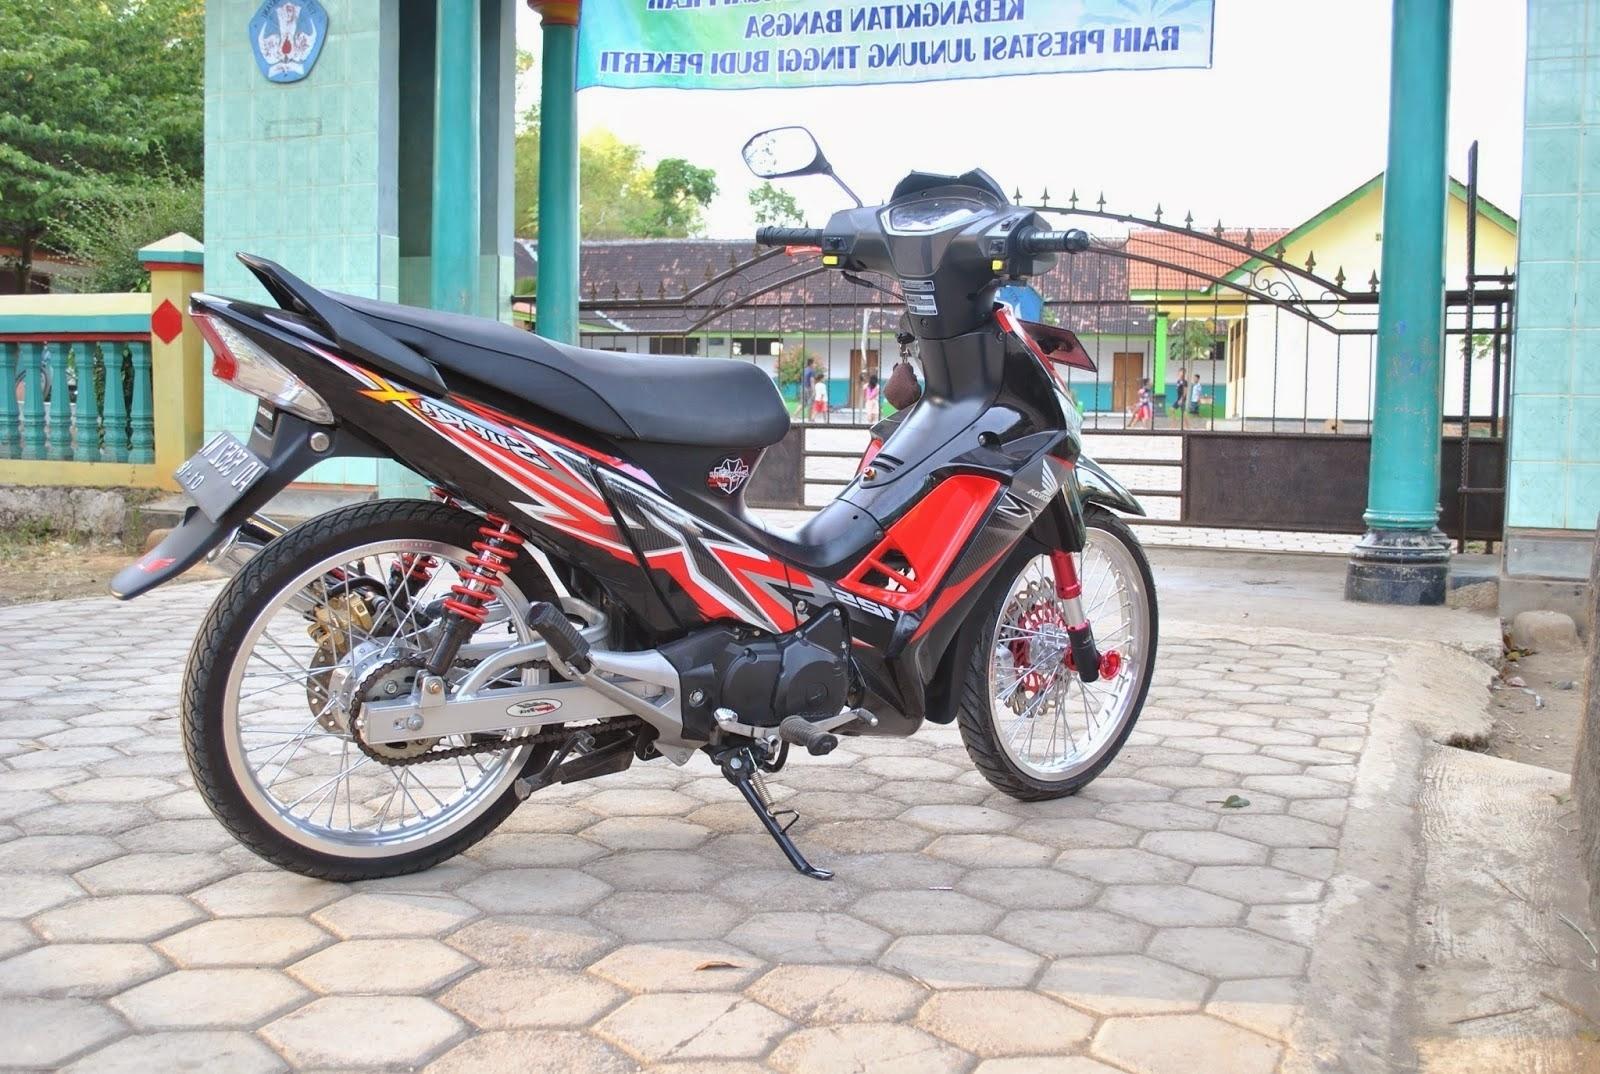 Modifikasi Motor Honda Supra X 125 Kumpulan Modifikasi Motor